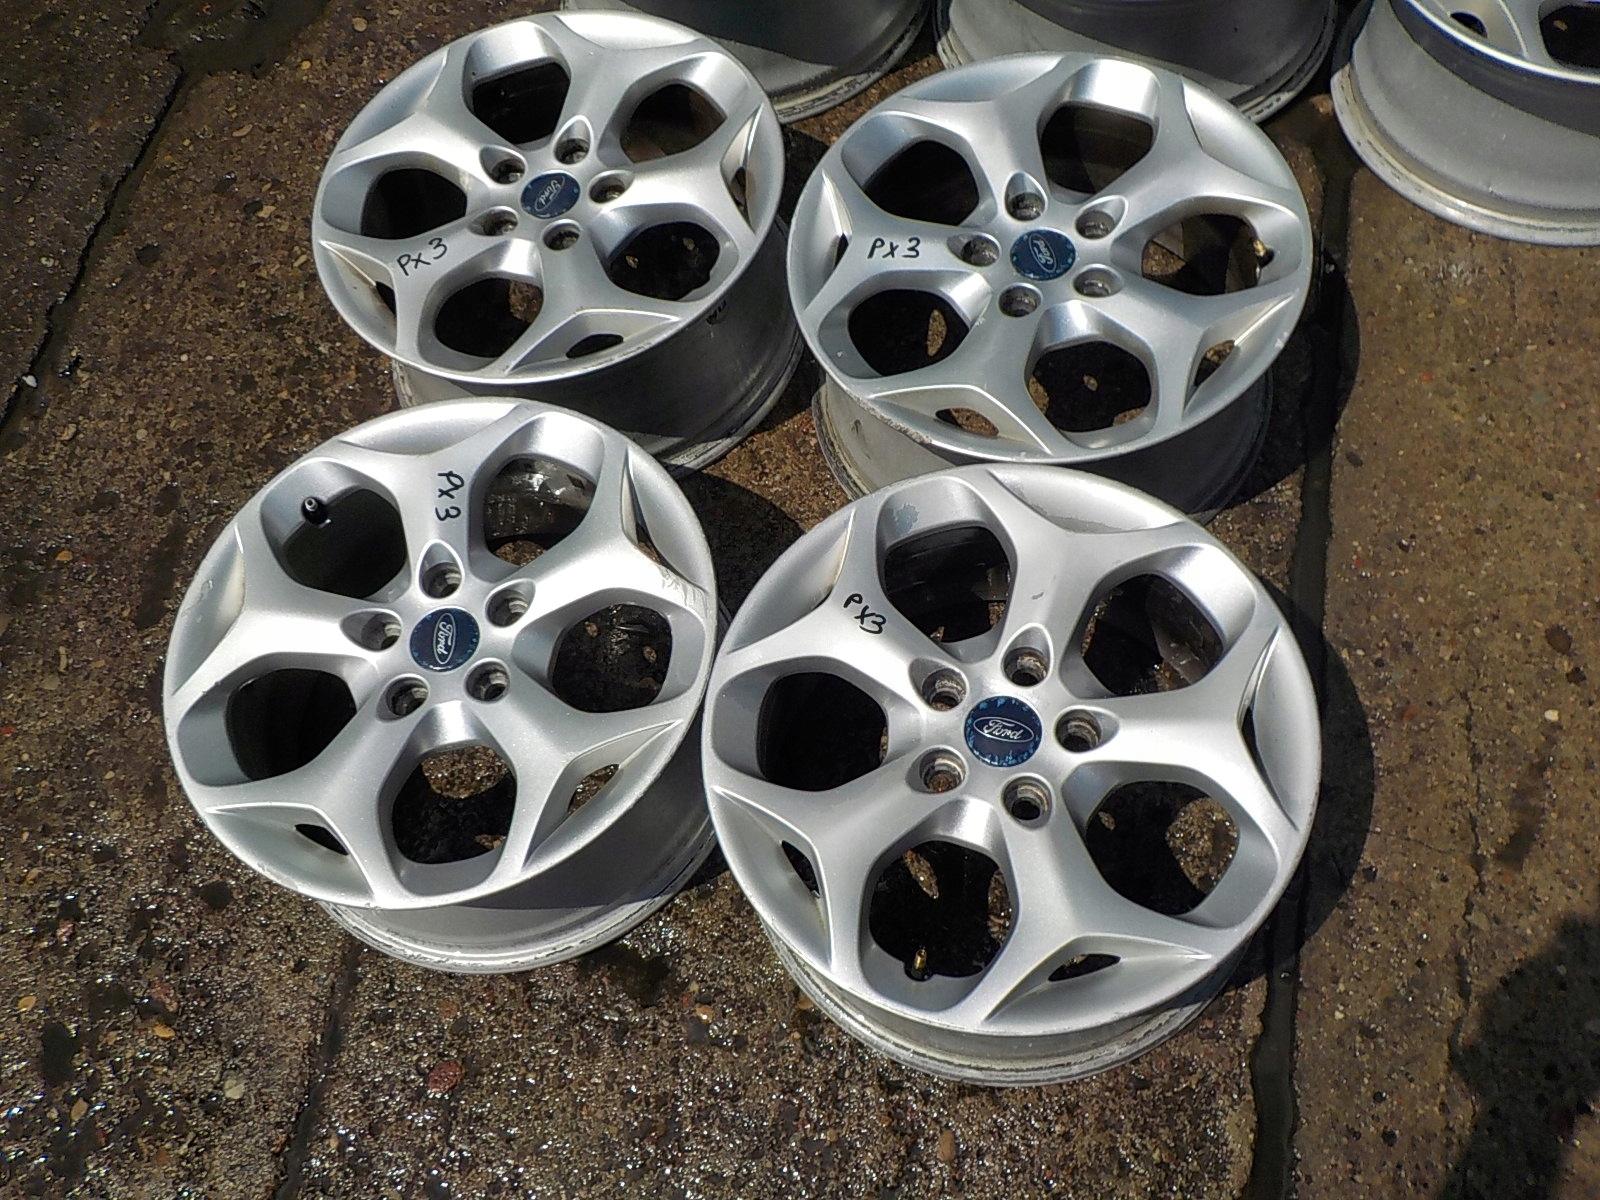 Ford Focus Mk3 C Max Mk2 Felgi Aluminiowe 16 5x108 7443553840